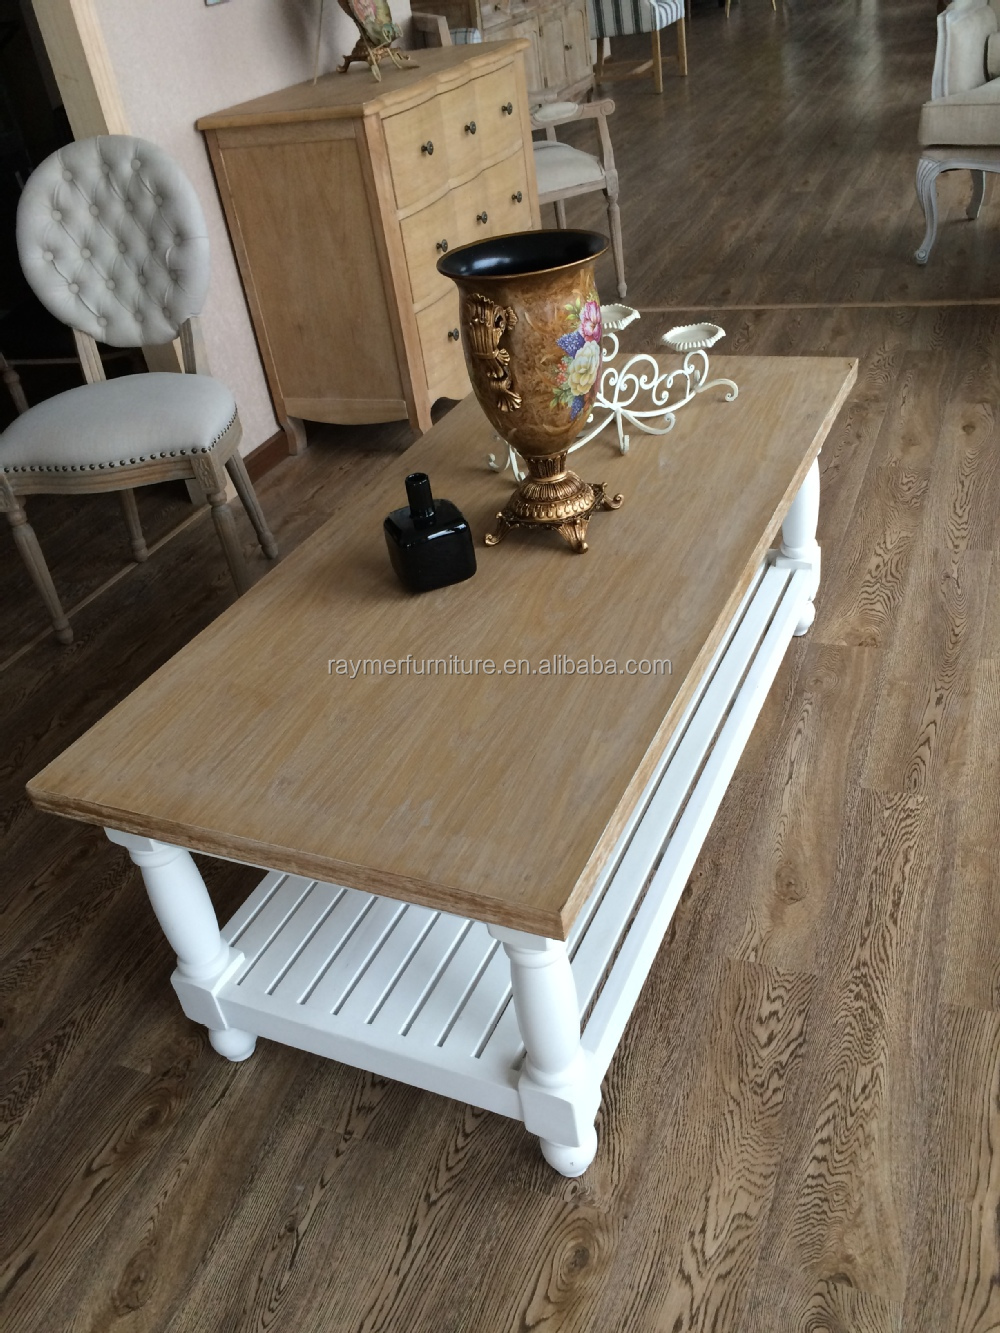 Magnífico Reposapiés Muebles Mesa De Café Composición - Muebles Para ...